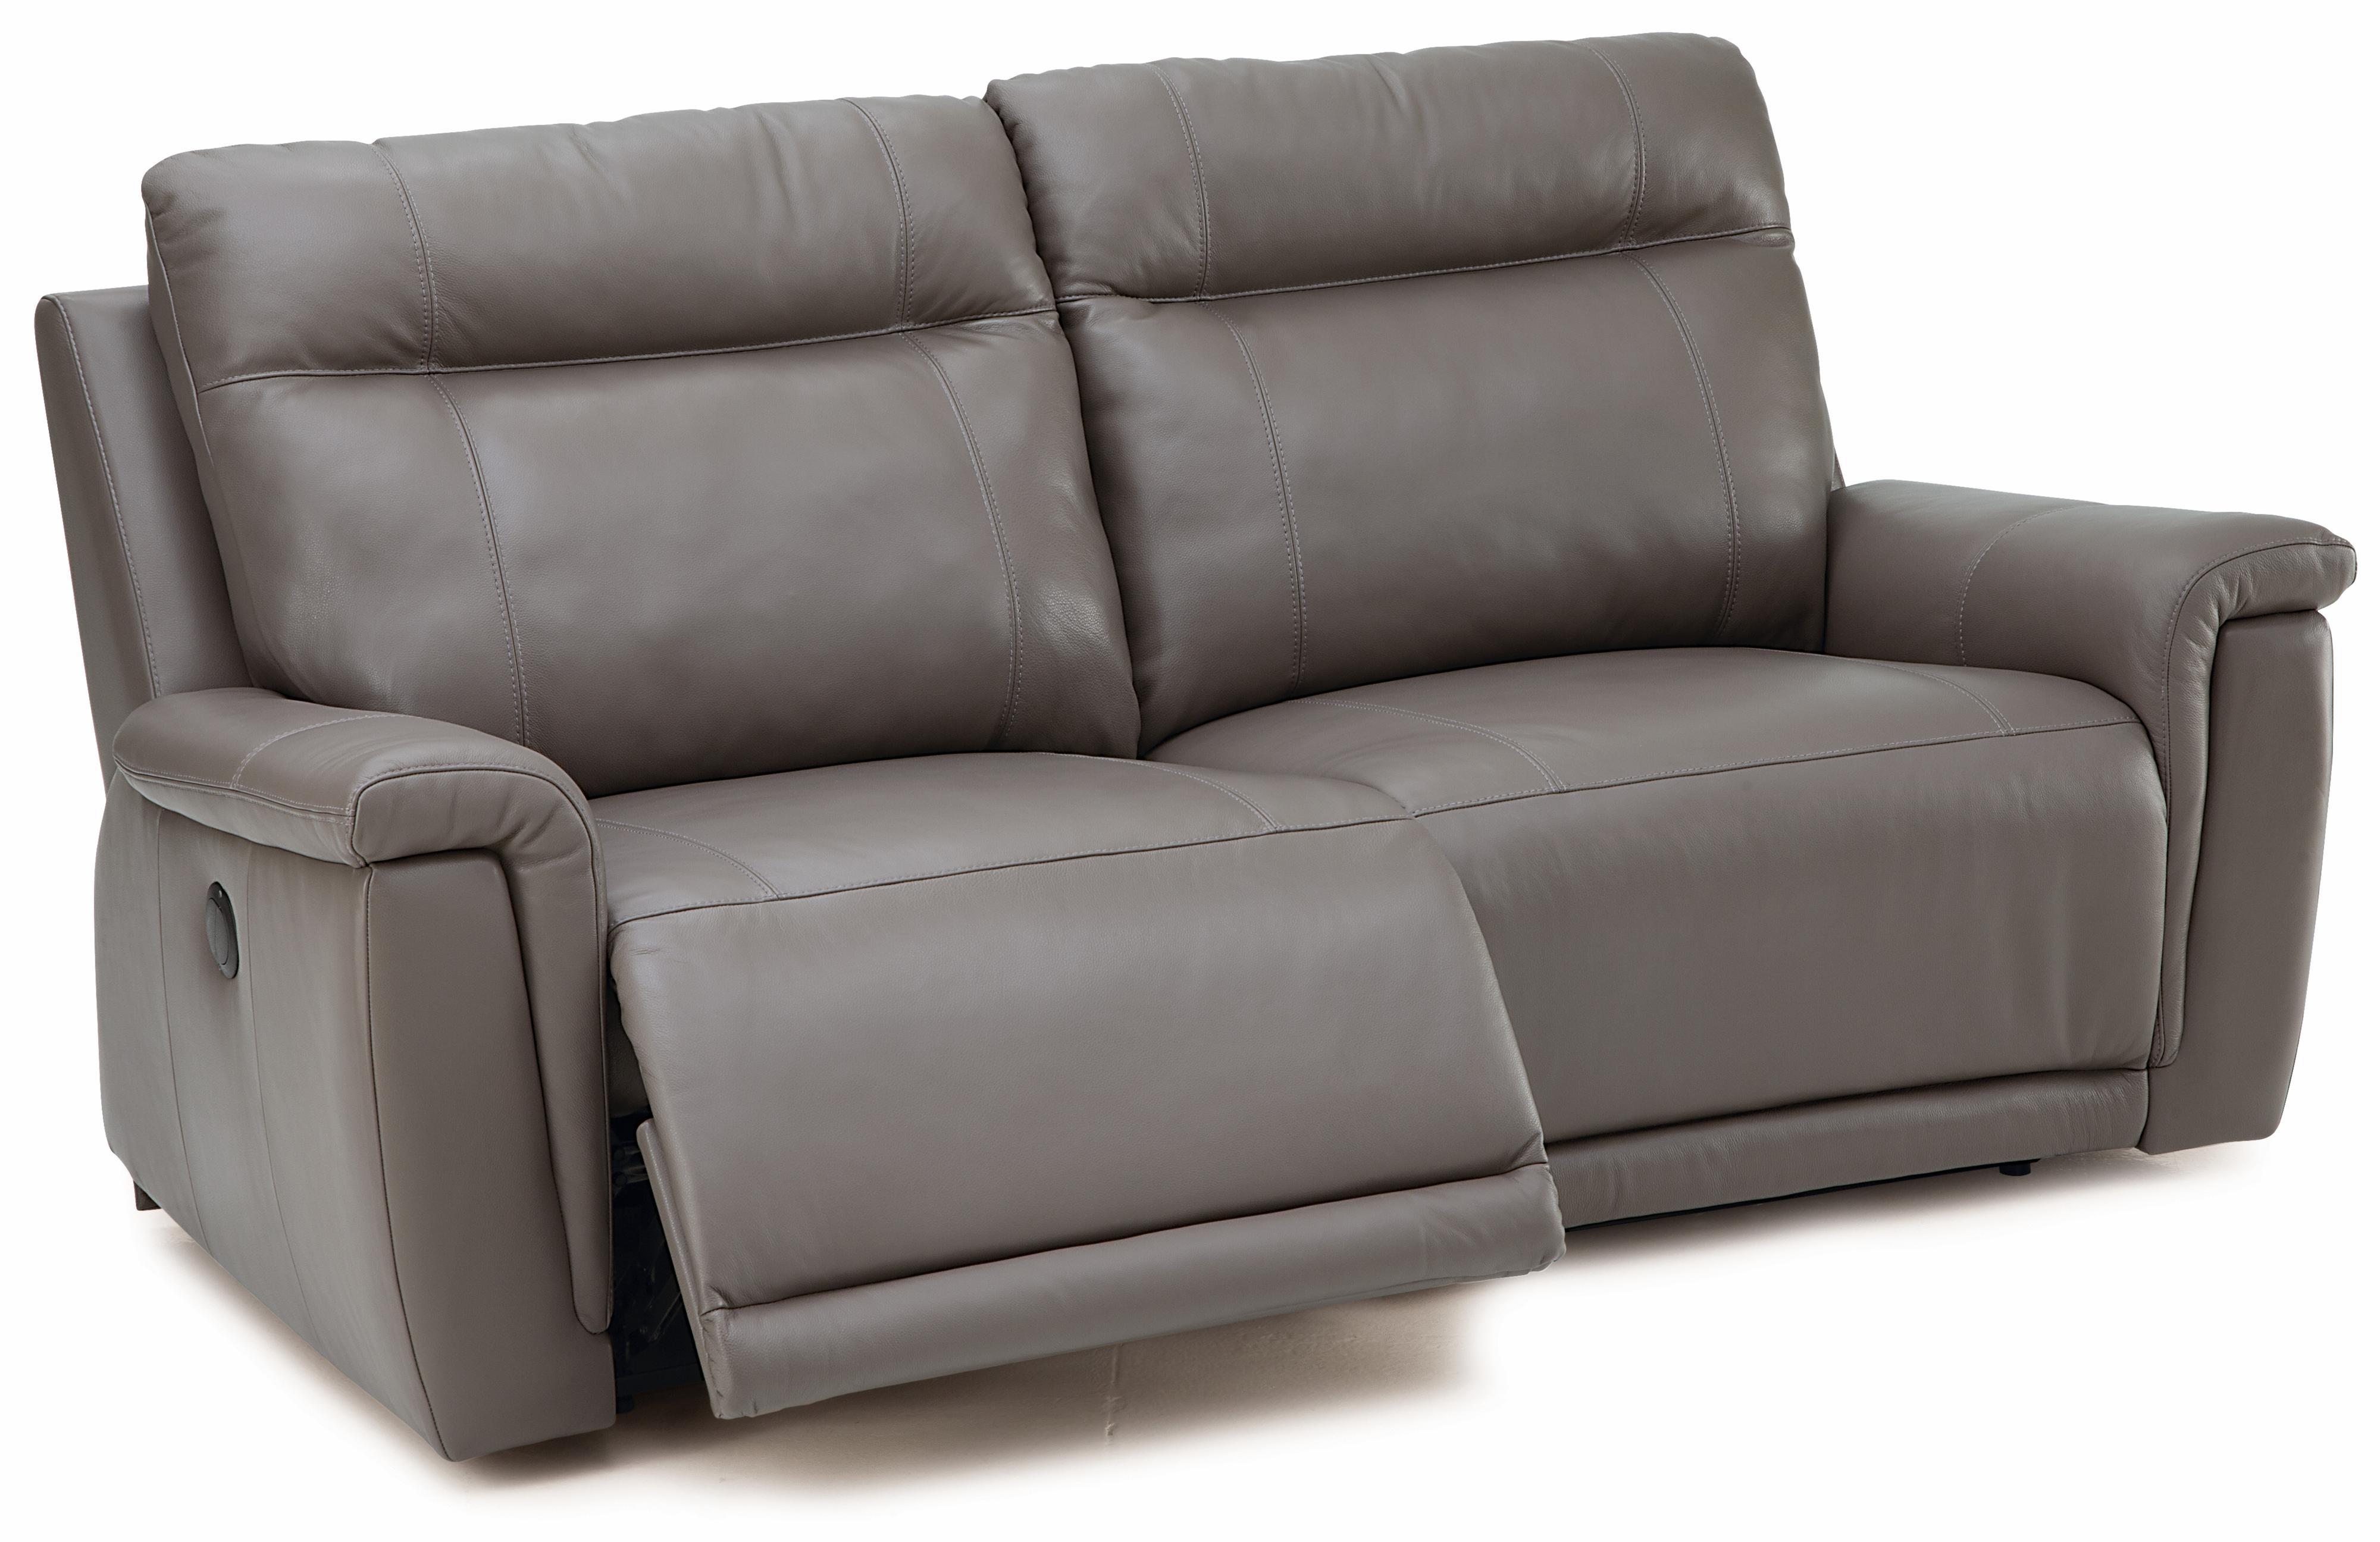 Westpoint Power Sofa by Palliser at Stoney Creek Furniture